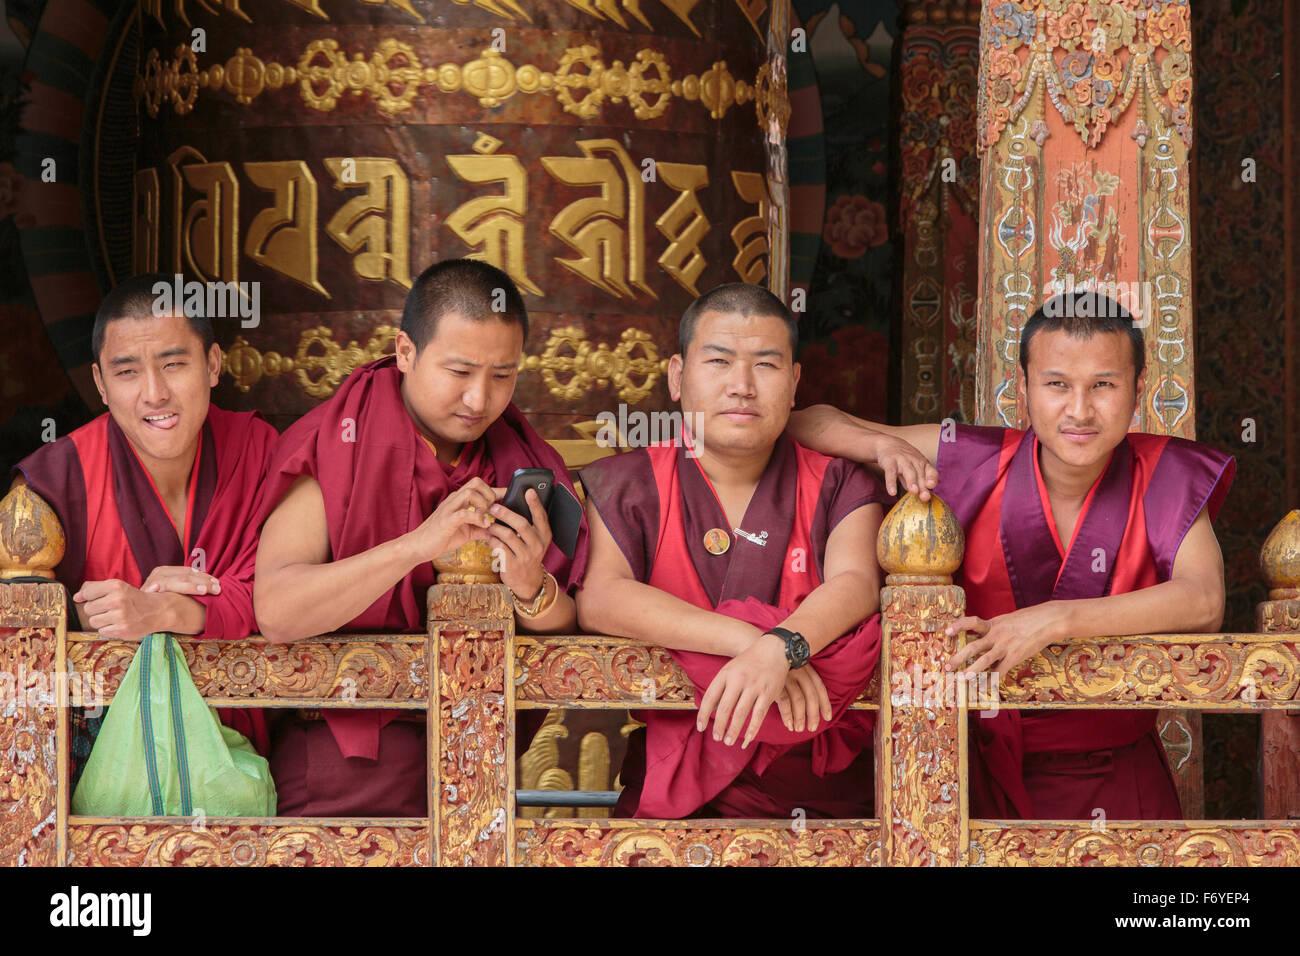 Monks, Bhutan - Stock Image